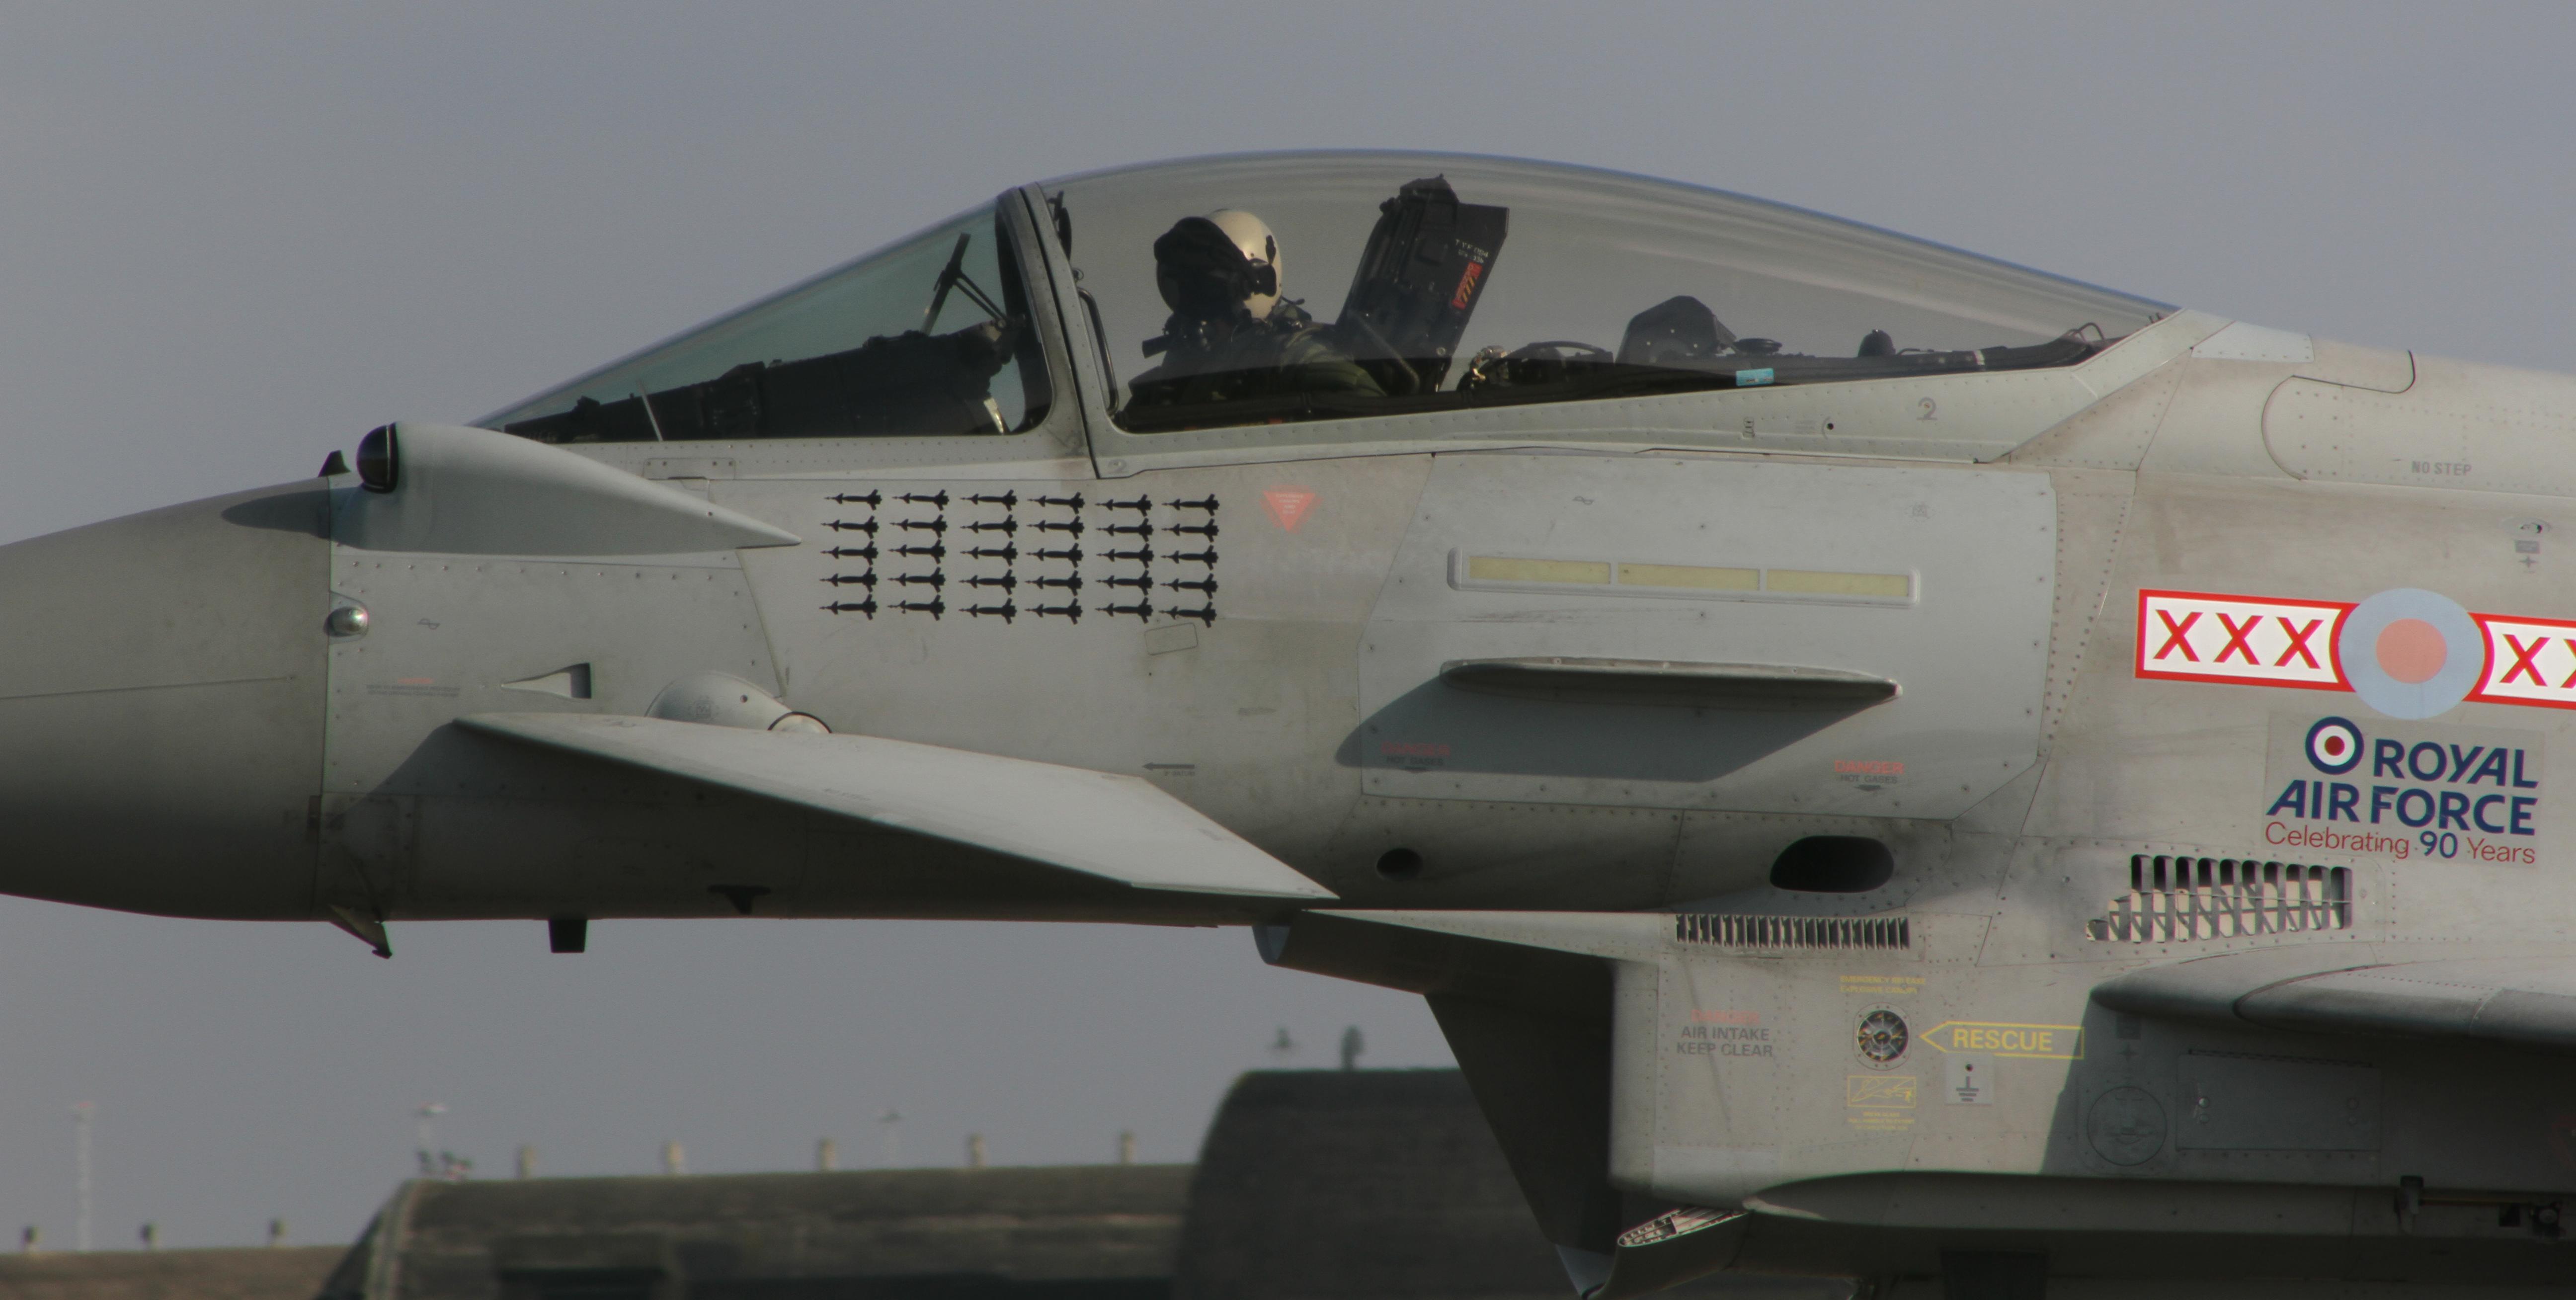 B060 RAF Typhoon